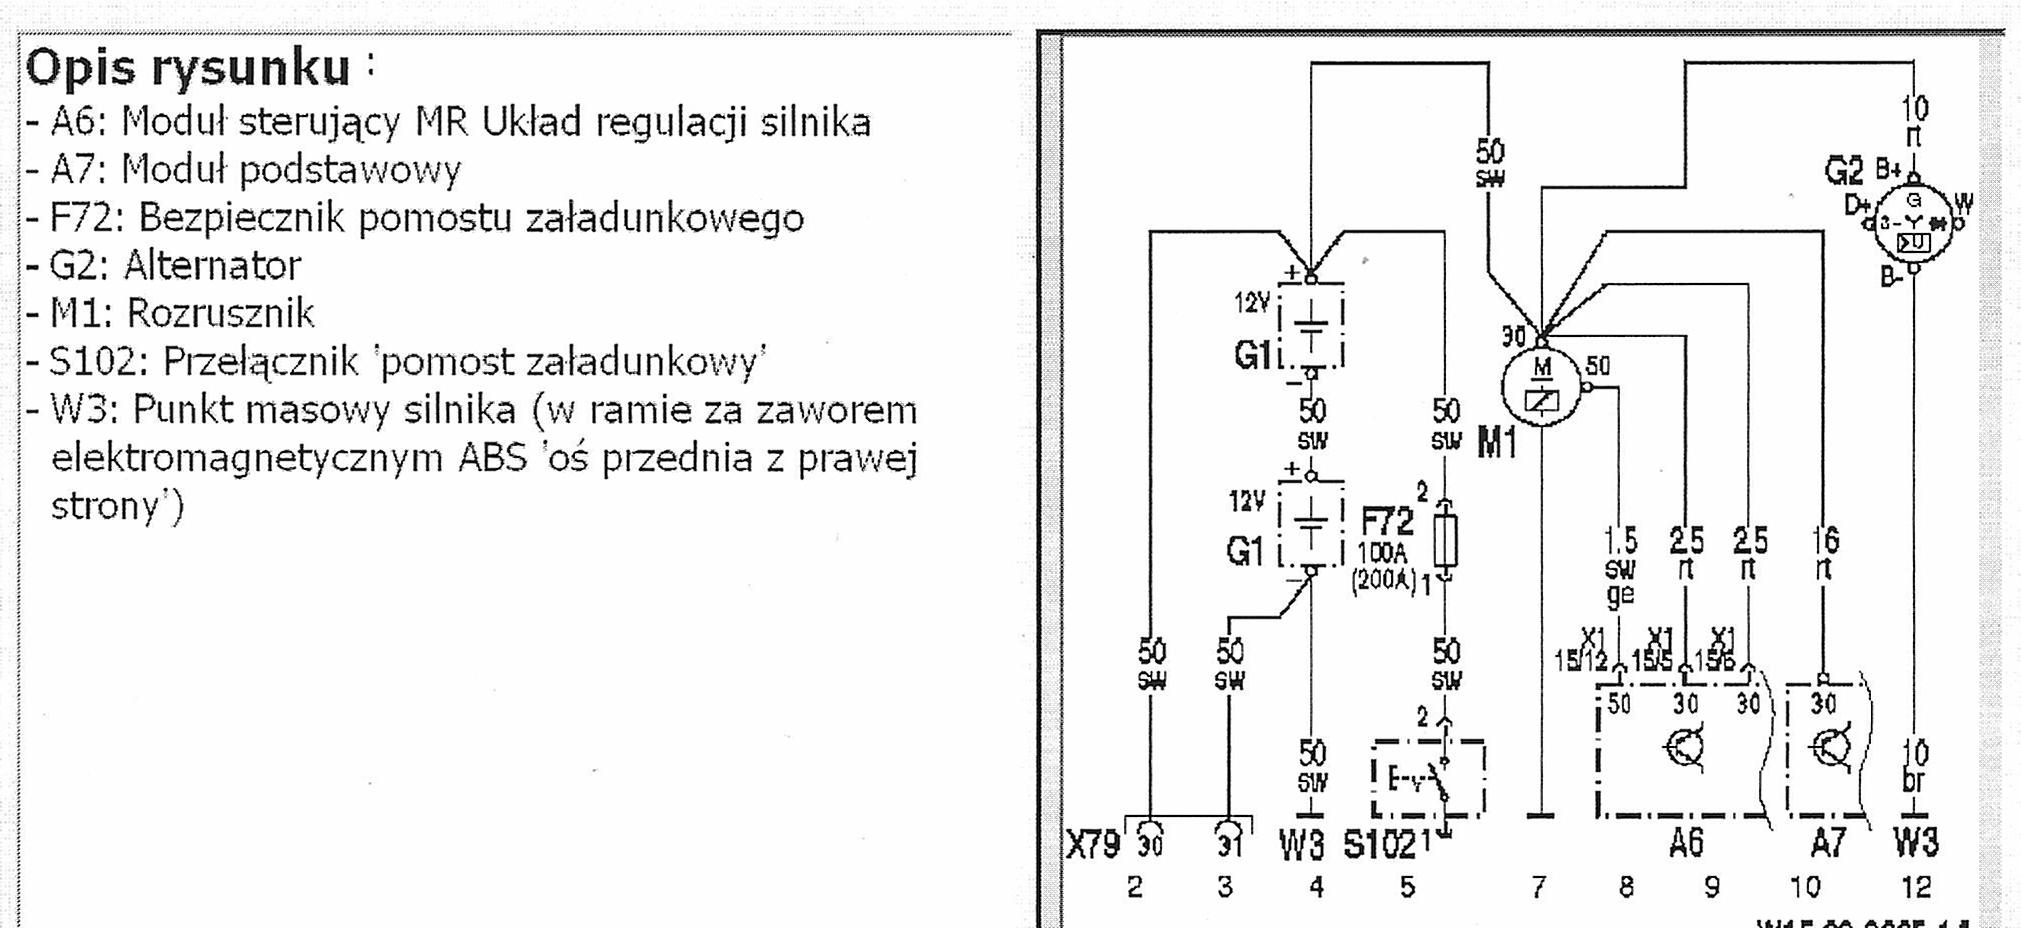 Mercedes - ECO Power 96r rozrusznik nie reaguj� .